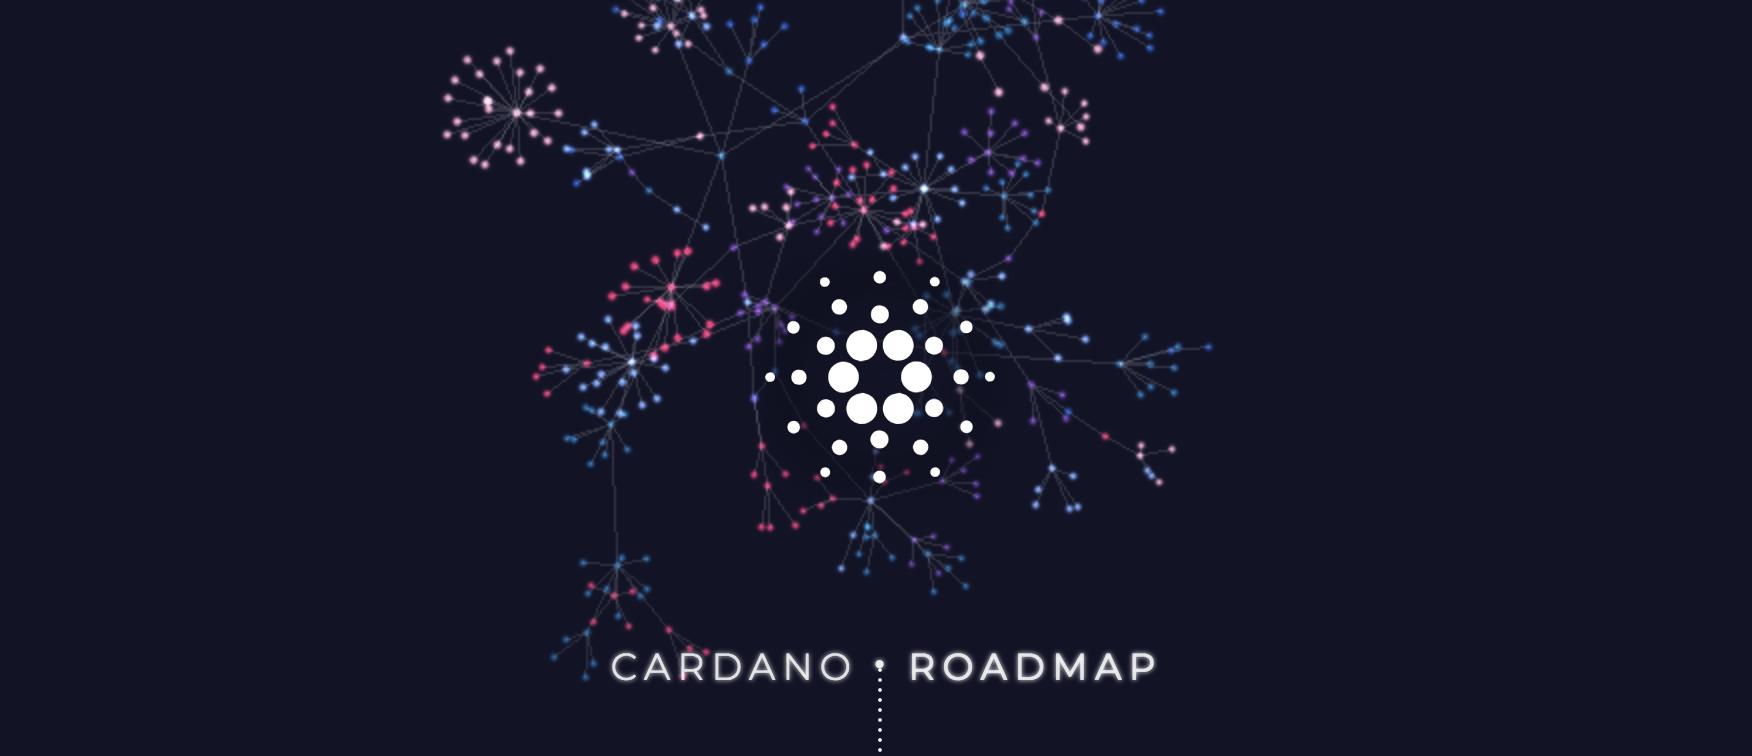 Cardano(カルダノ) 12月 ロードマップ更新